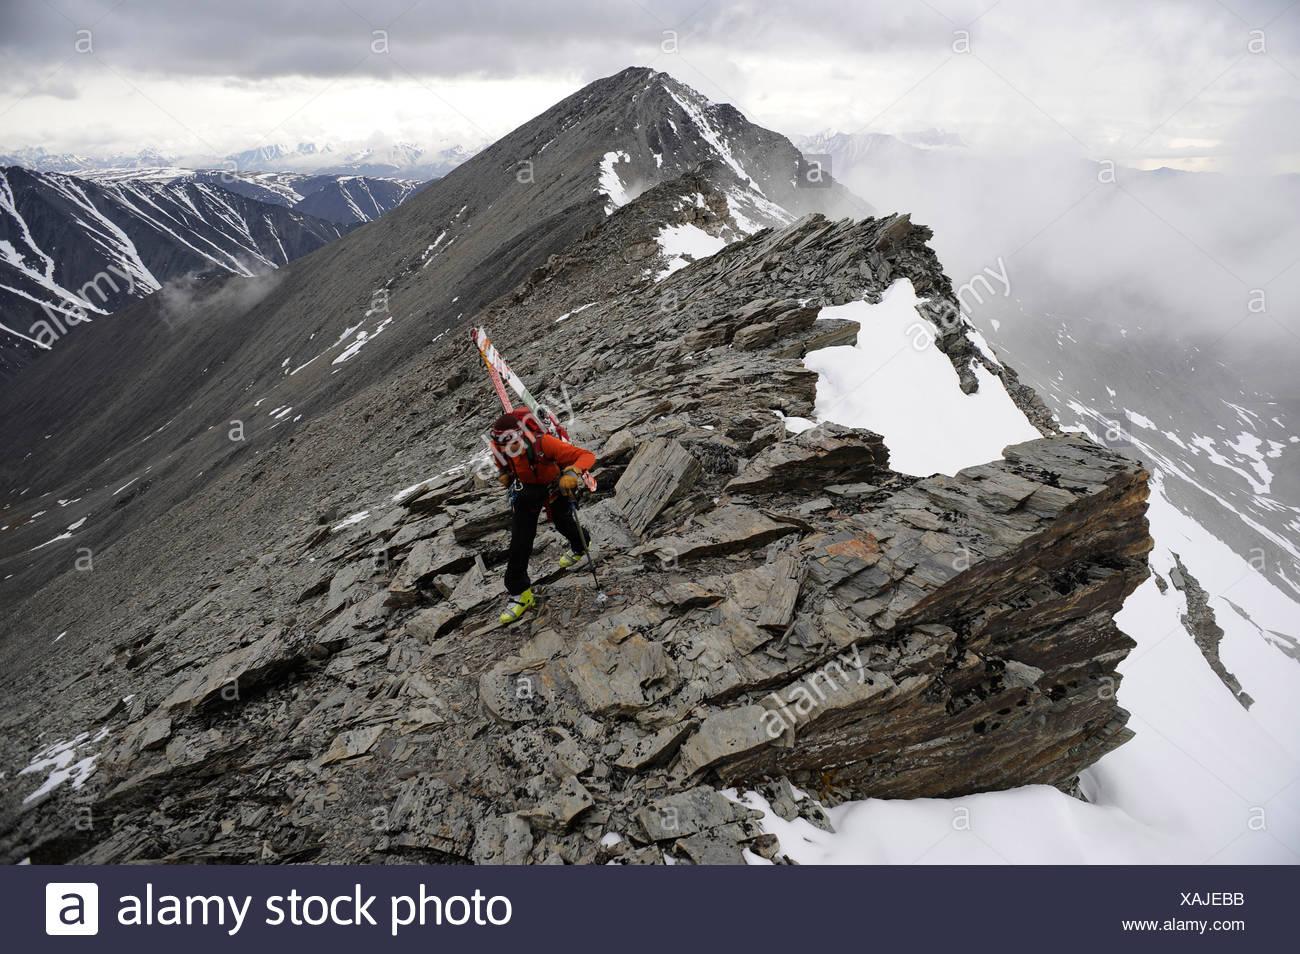 Backpacker climbs the West Ridge of Mt. Chamberlin in the Brooks Range, ANWR, Arctic Alaska, Summer - Stock Image